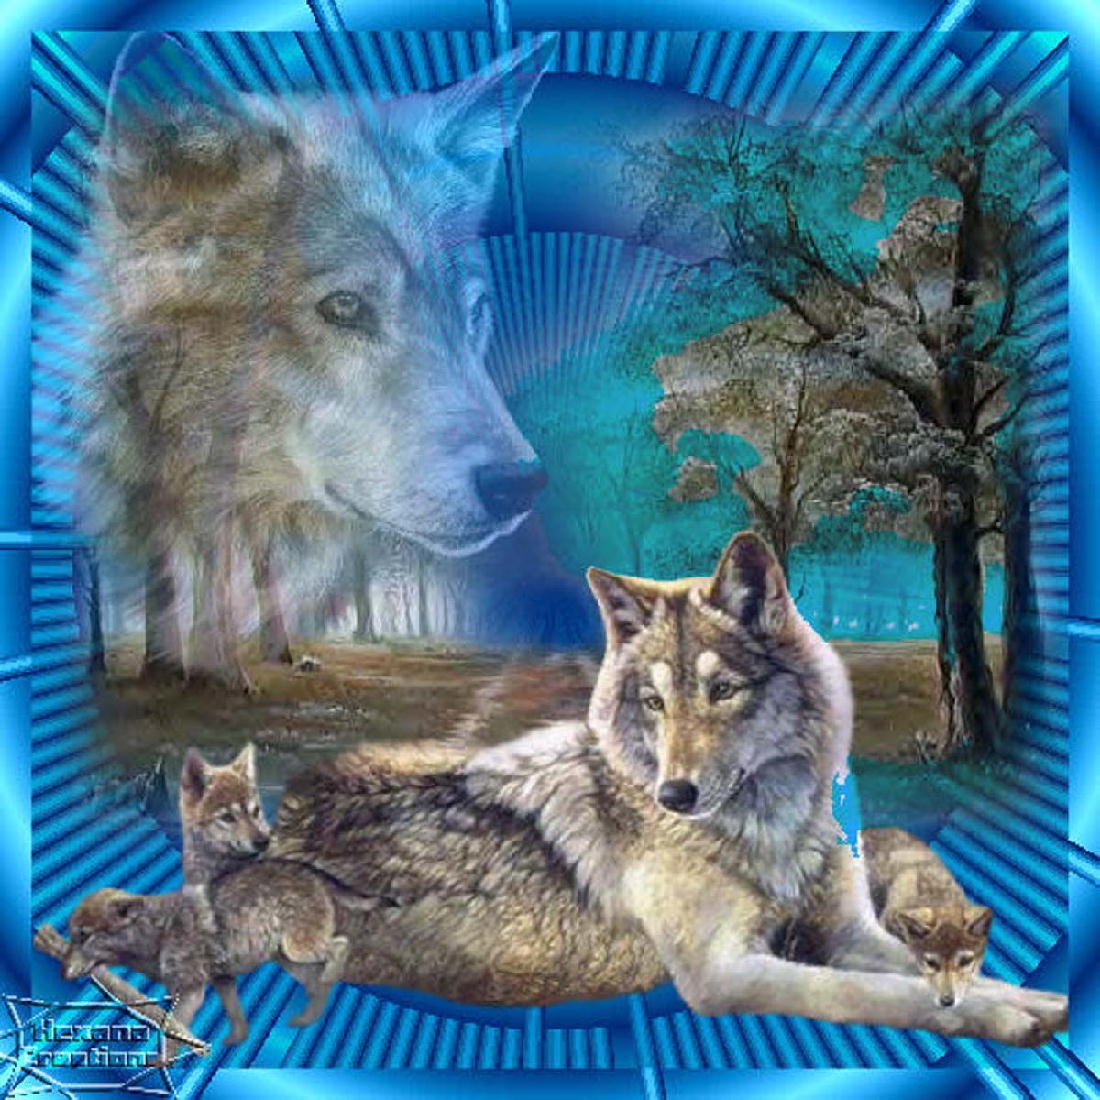 fond d'ecran loup